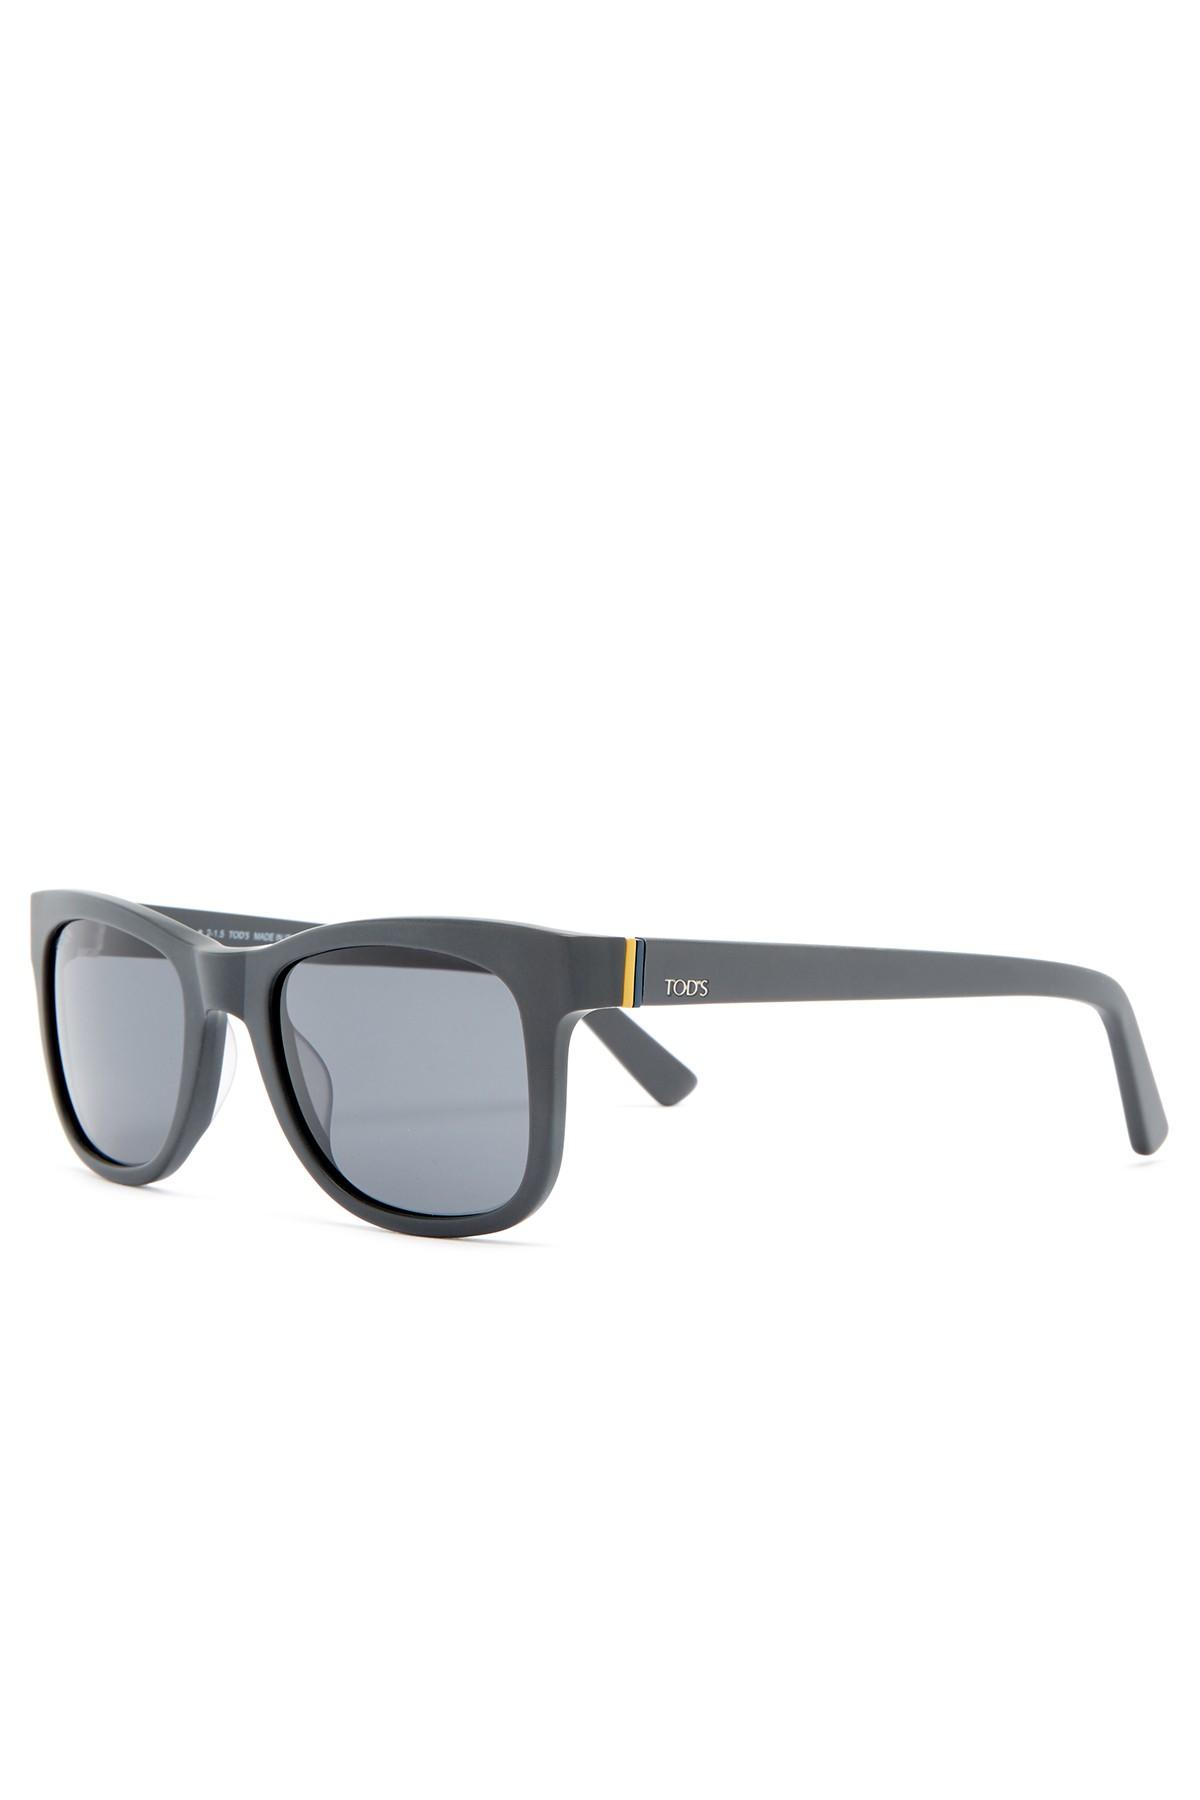 Tods Unisex Square Sunglasses Fashion